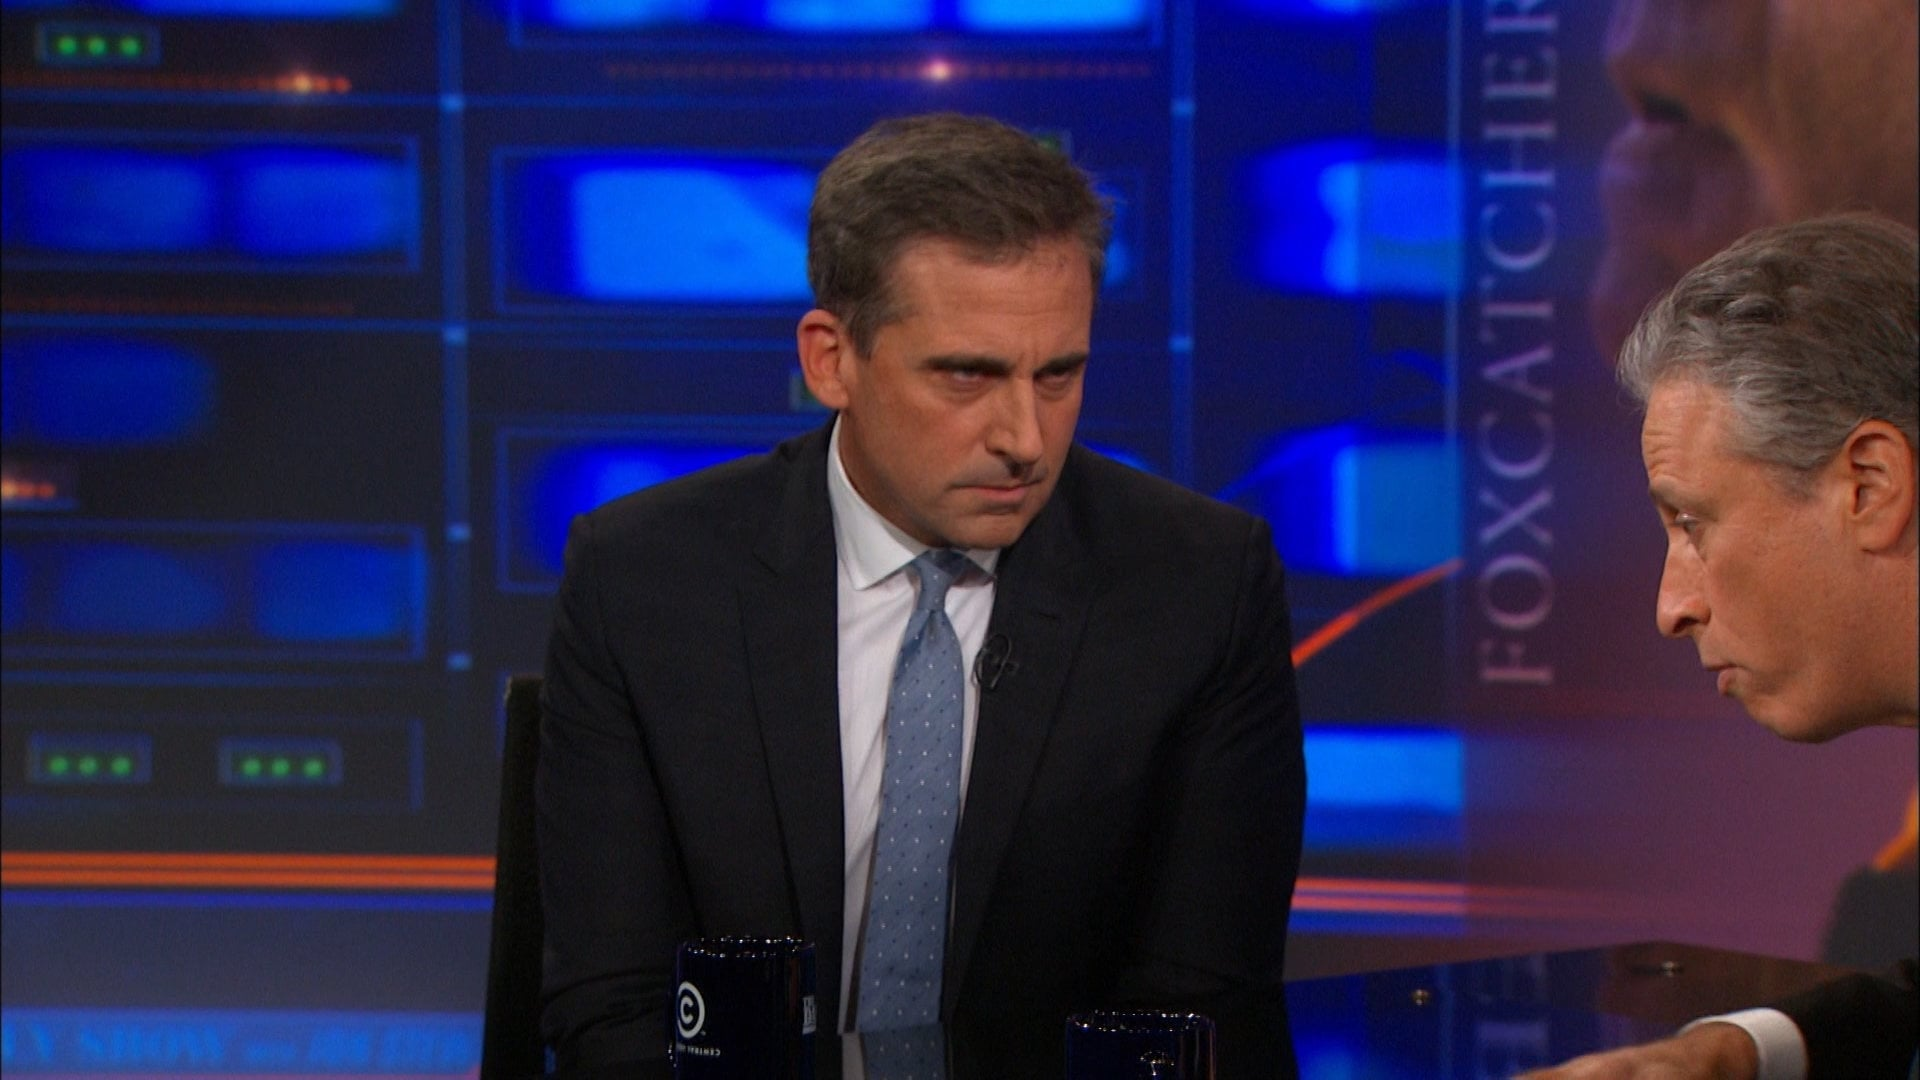 The Daily Show with Trevor Noah Season 20 :Episode 23  Steve Carell